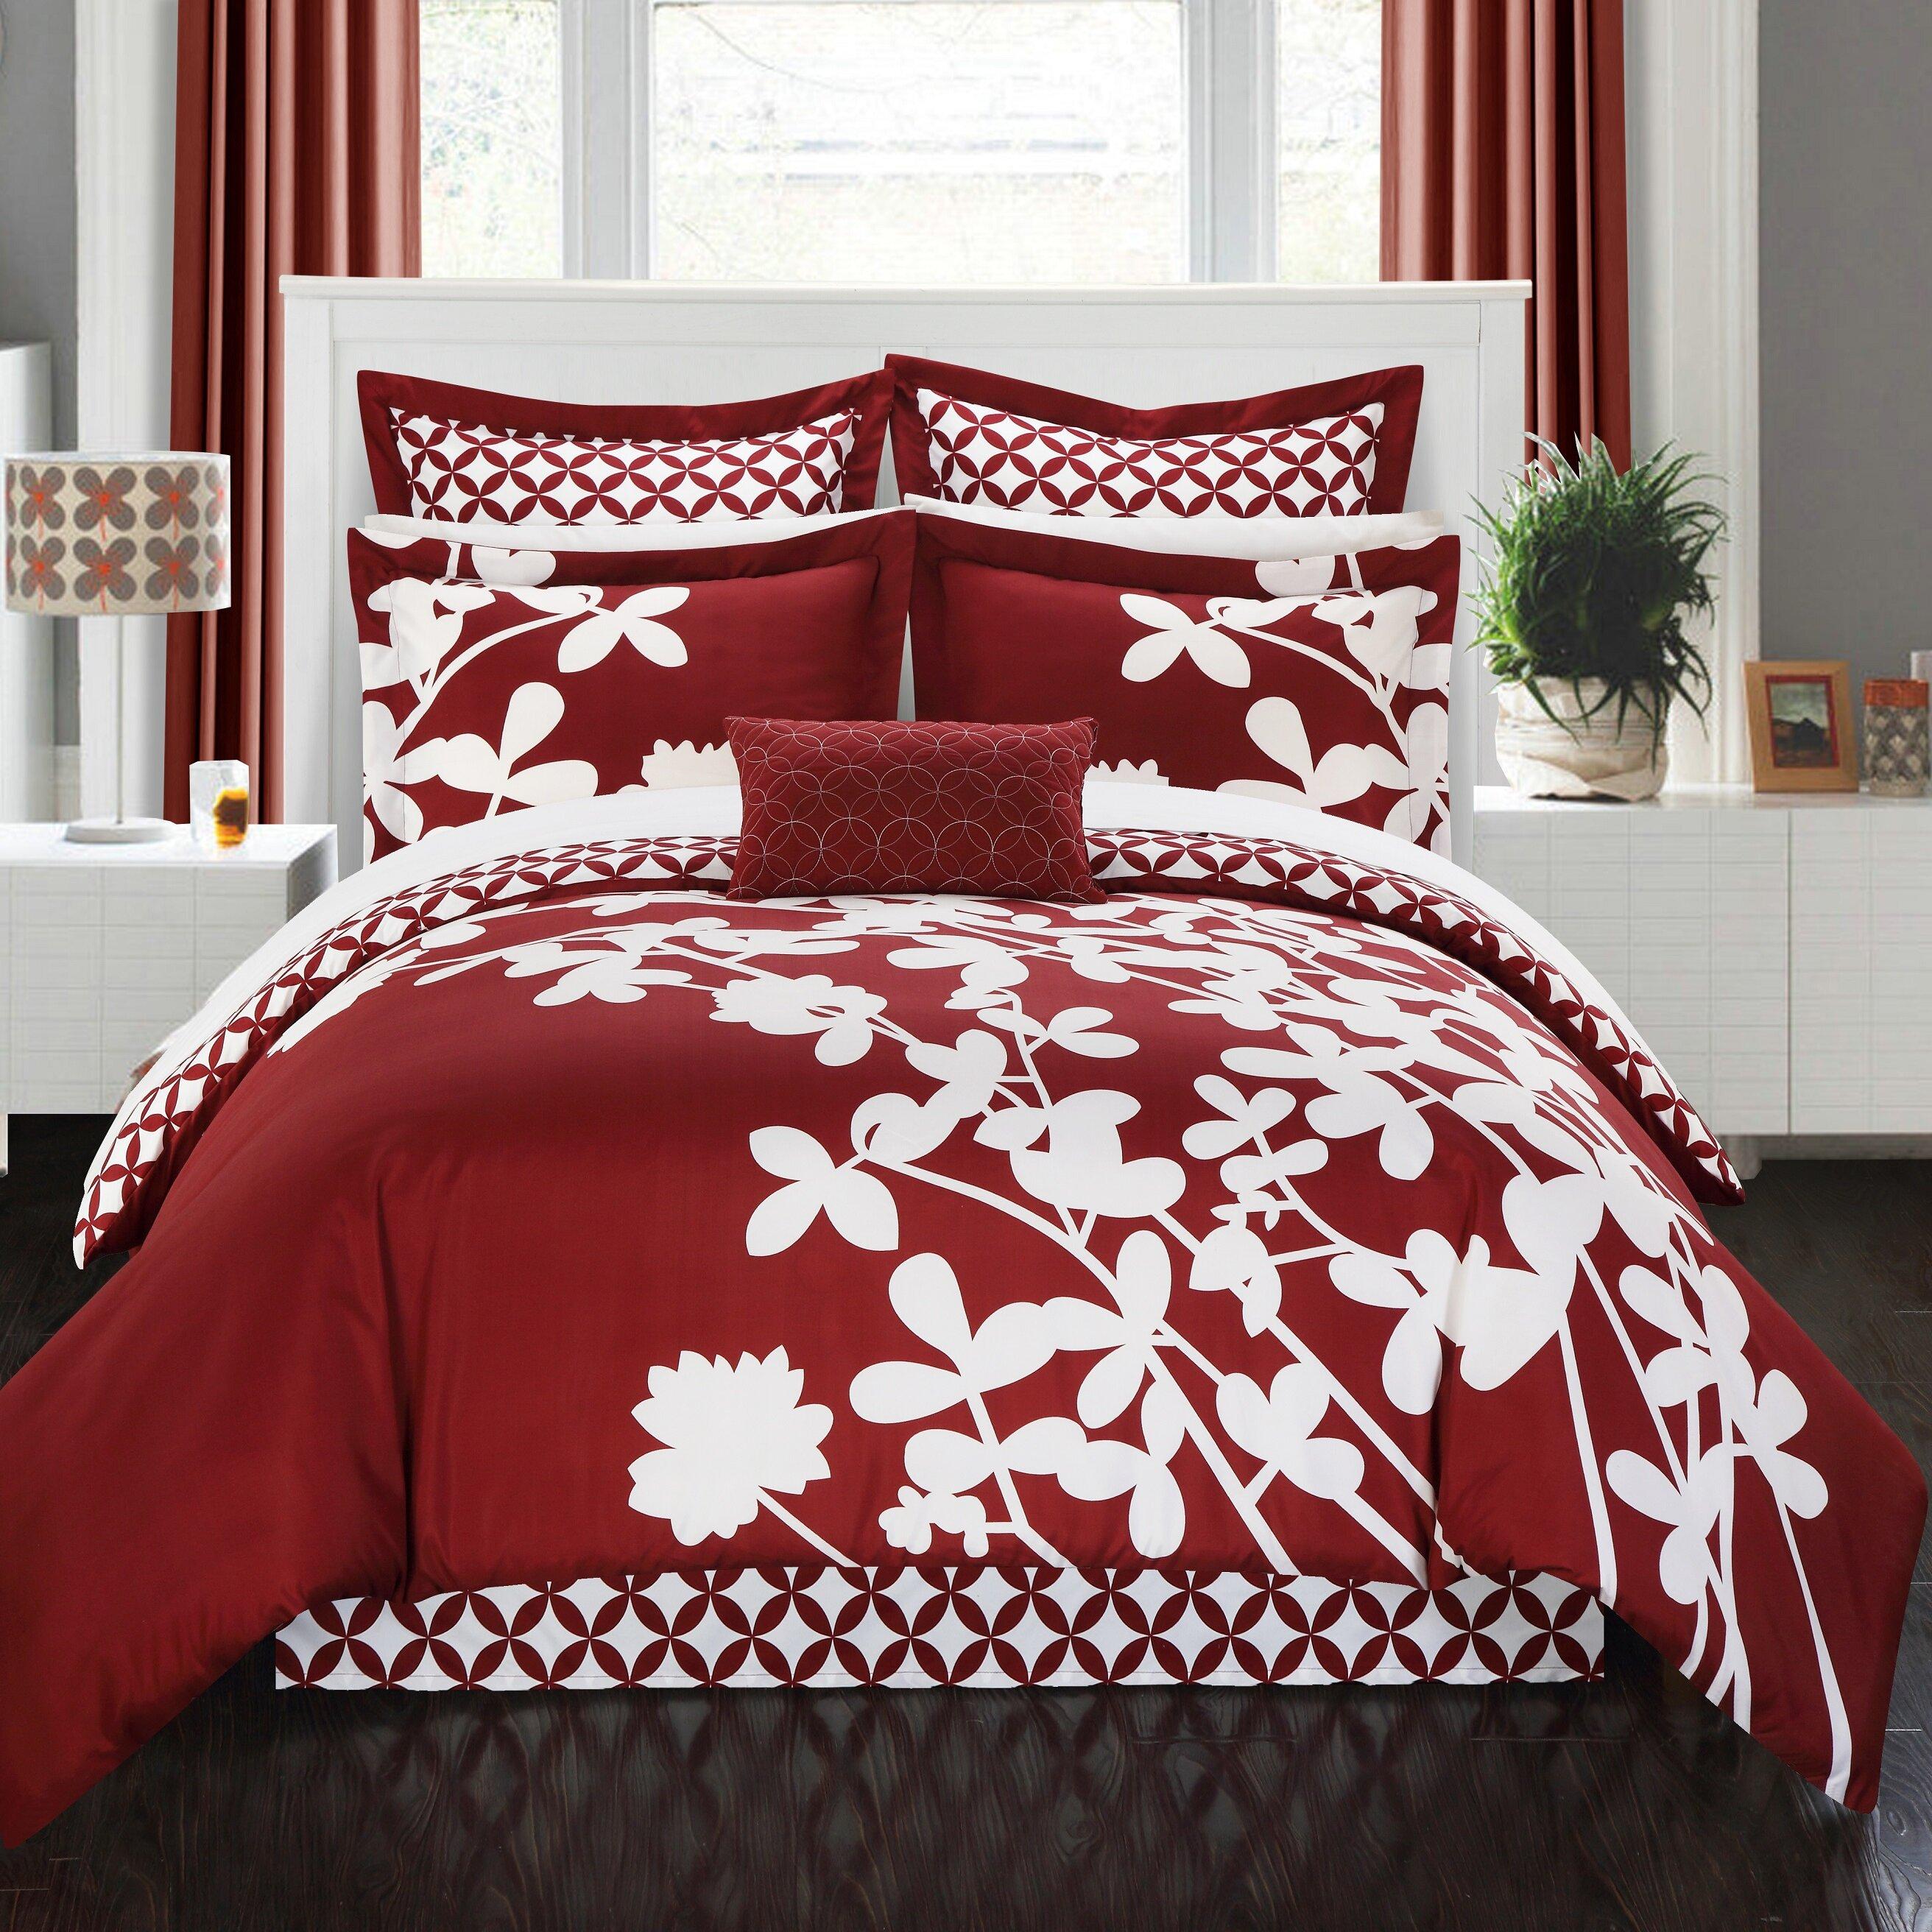 comforter corner photos impressive blue maroon outstanding sets girls bedding bedspread size full